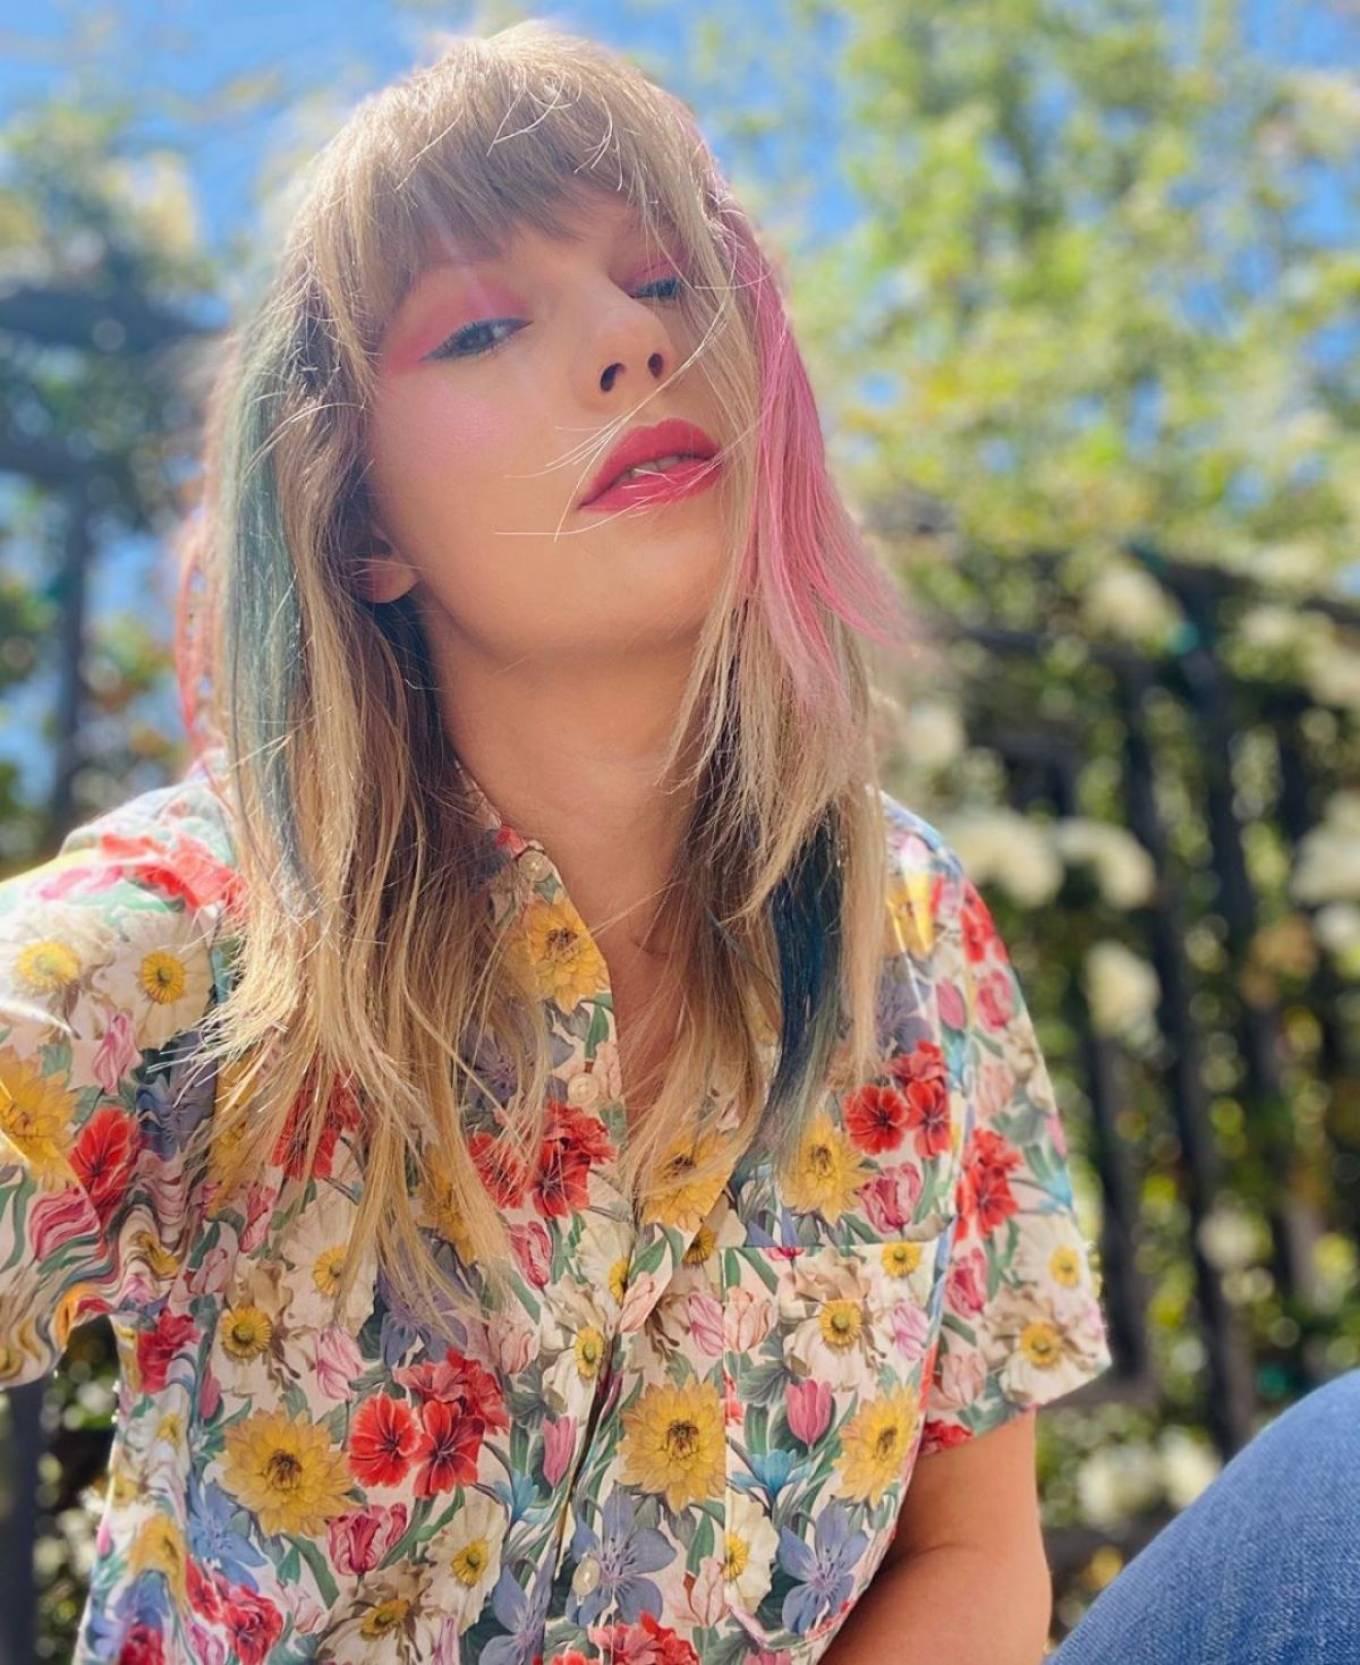 Taylor Swift - Shoot in a flower shirt